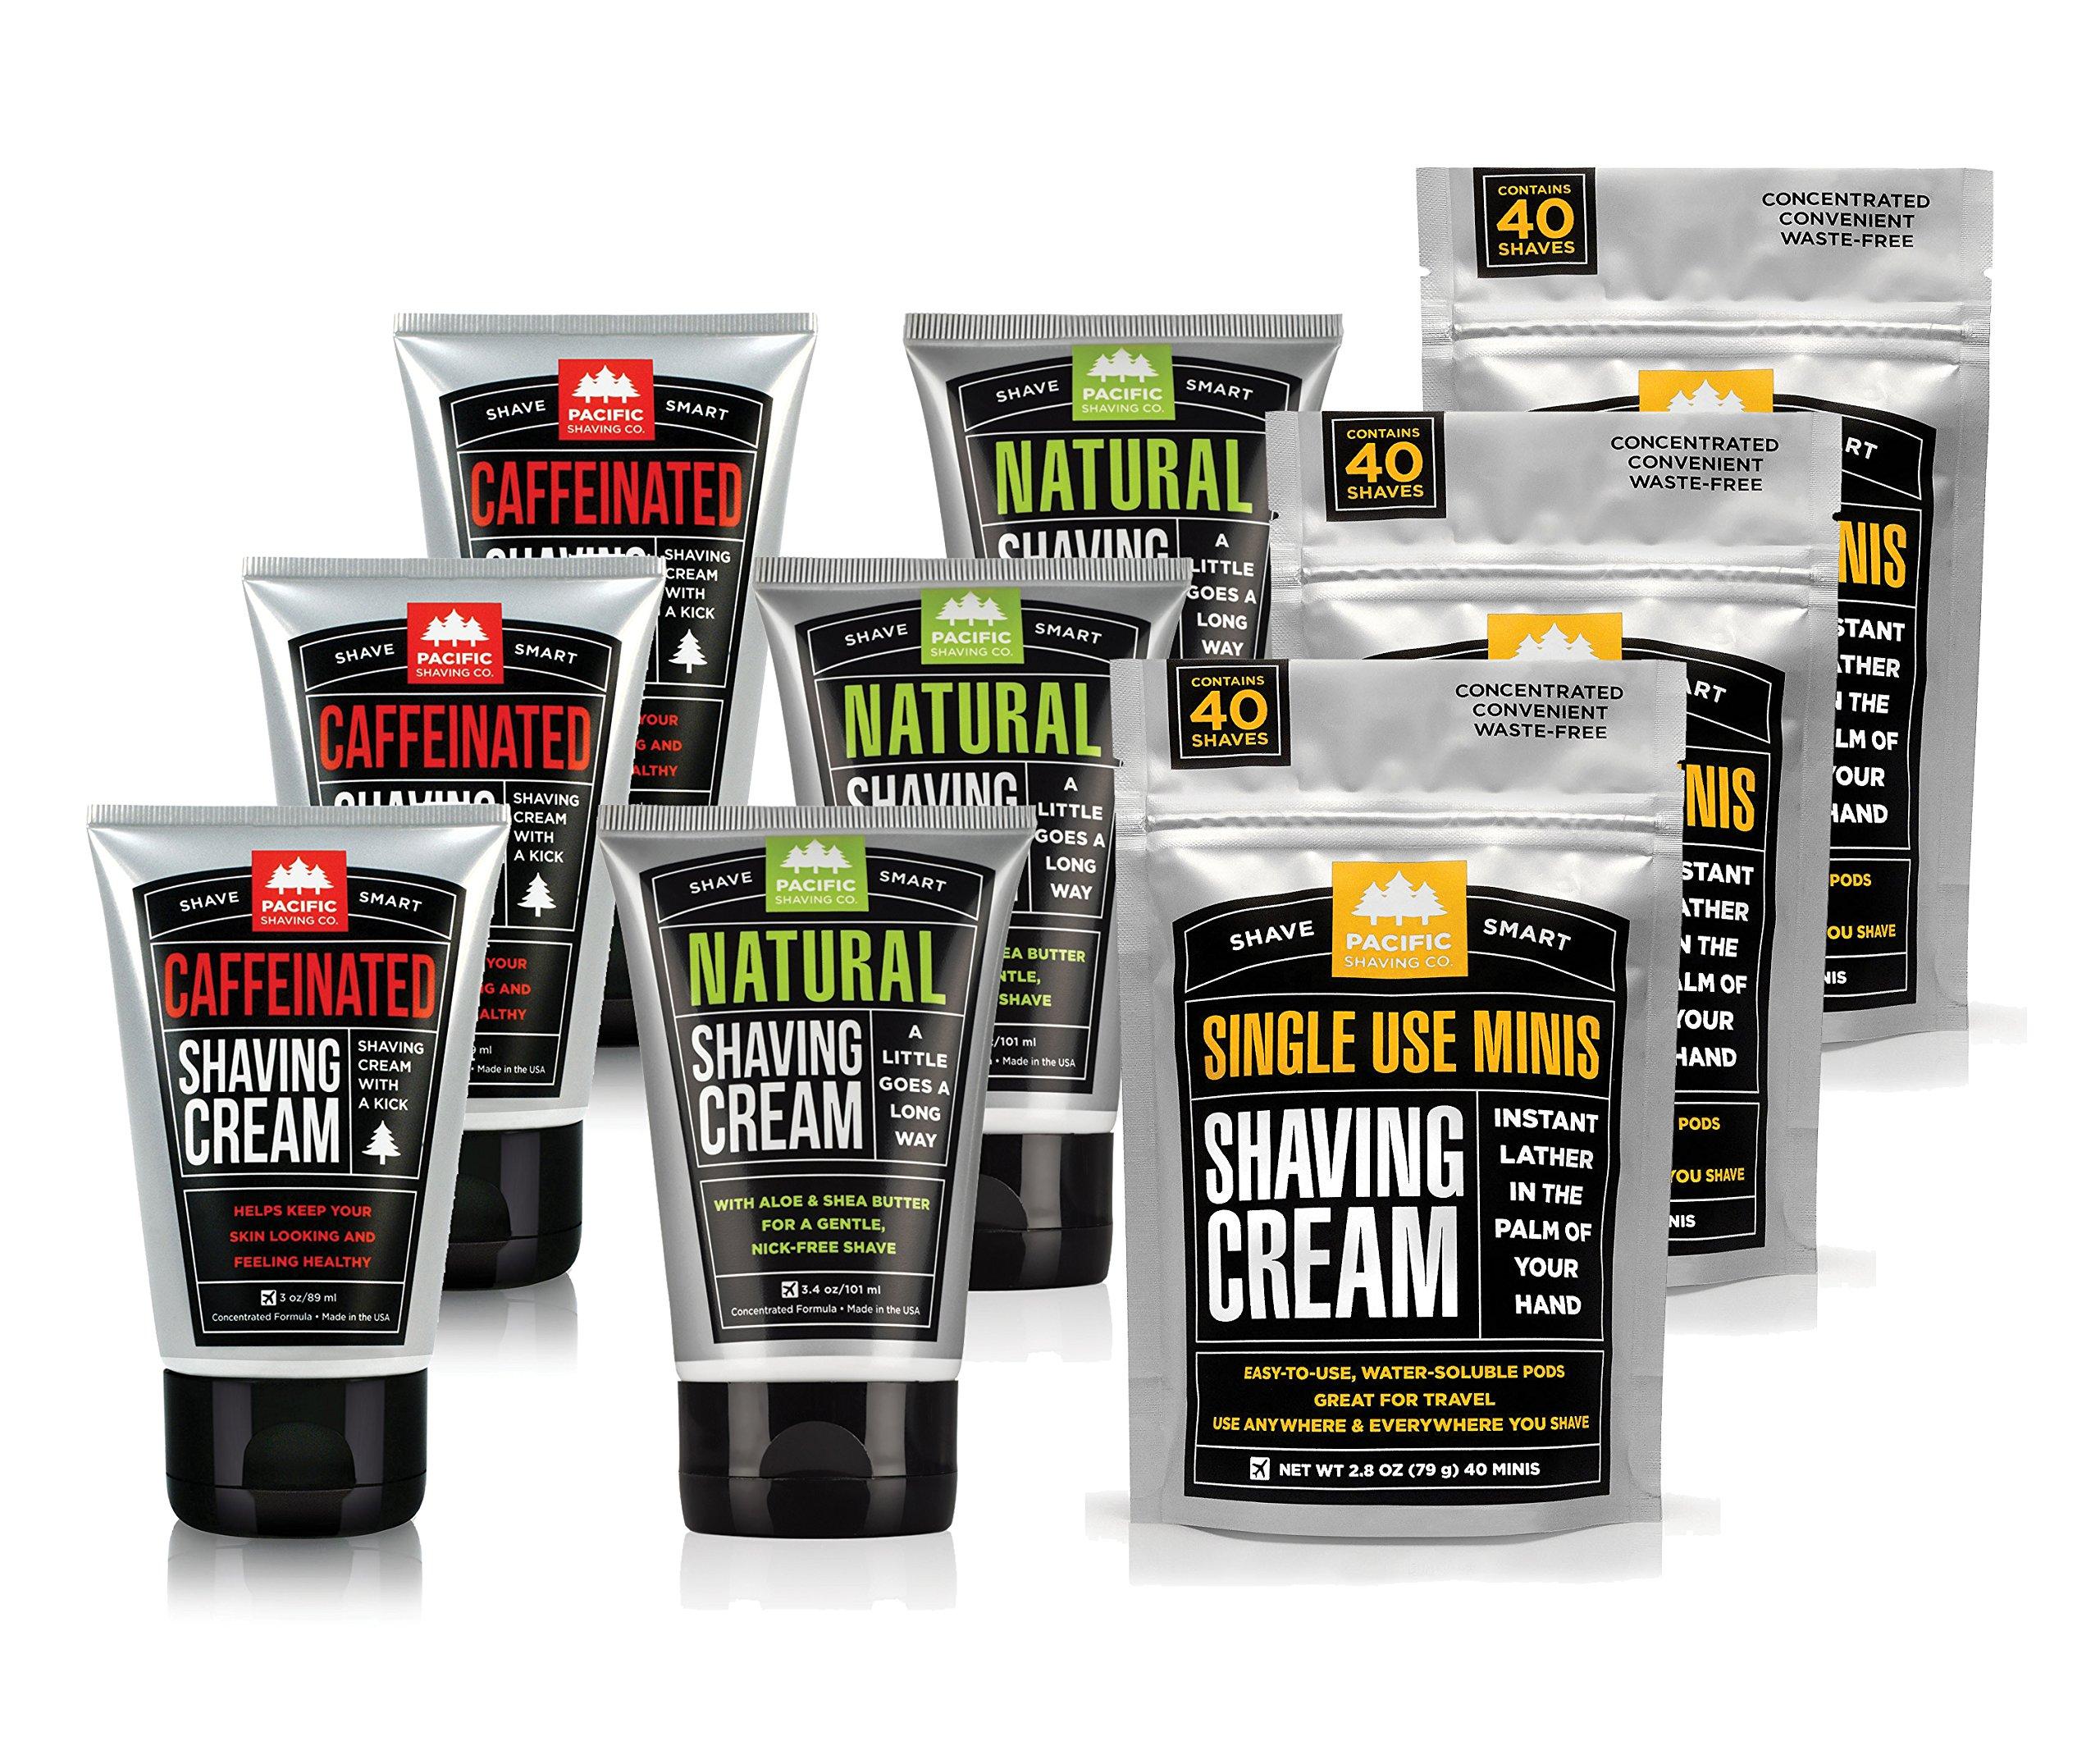 Pacific Shaving Company - BEST VALUE! TRIPLE Shaving Cream Variety Pack: Get (3x) NATURAL Shaving Cream + (3x) CAFFEINATED Shaving Cream + 3x SINGLE-USE Shaving Cream MINIS (40-pack)